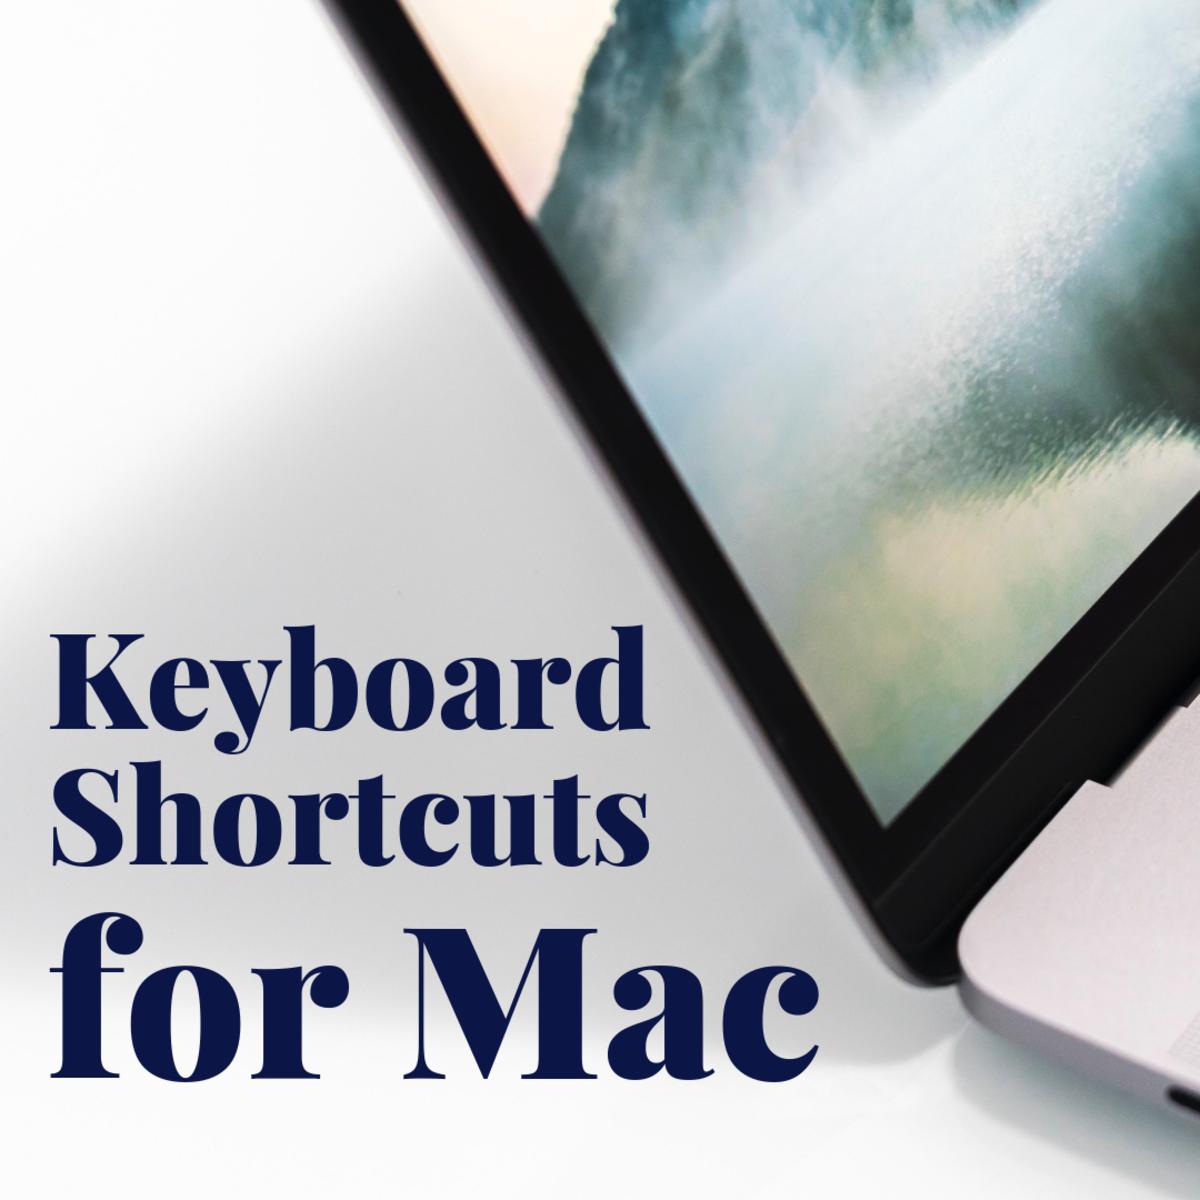 Useful Mac/Apple Keyboard Shortcuts You Should Know